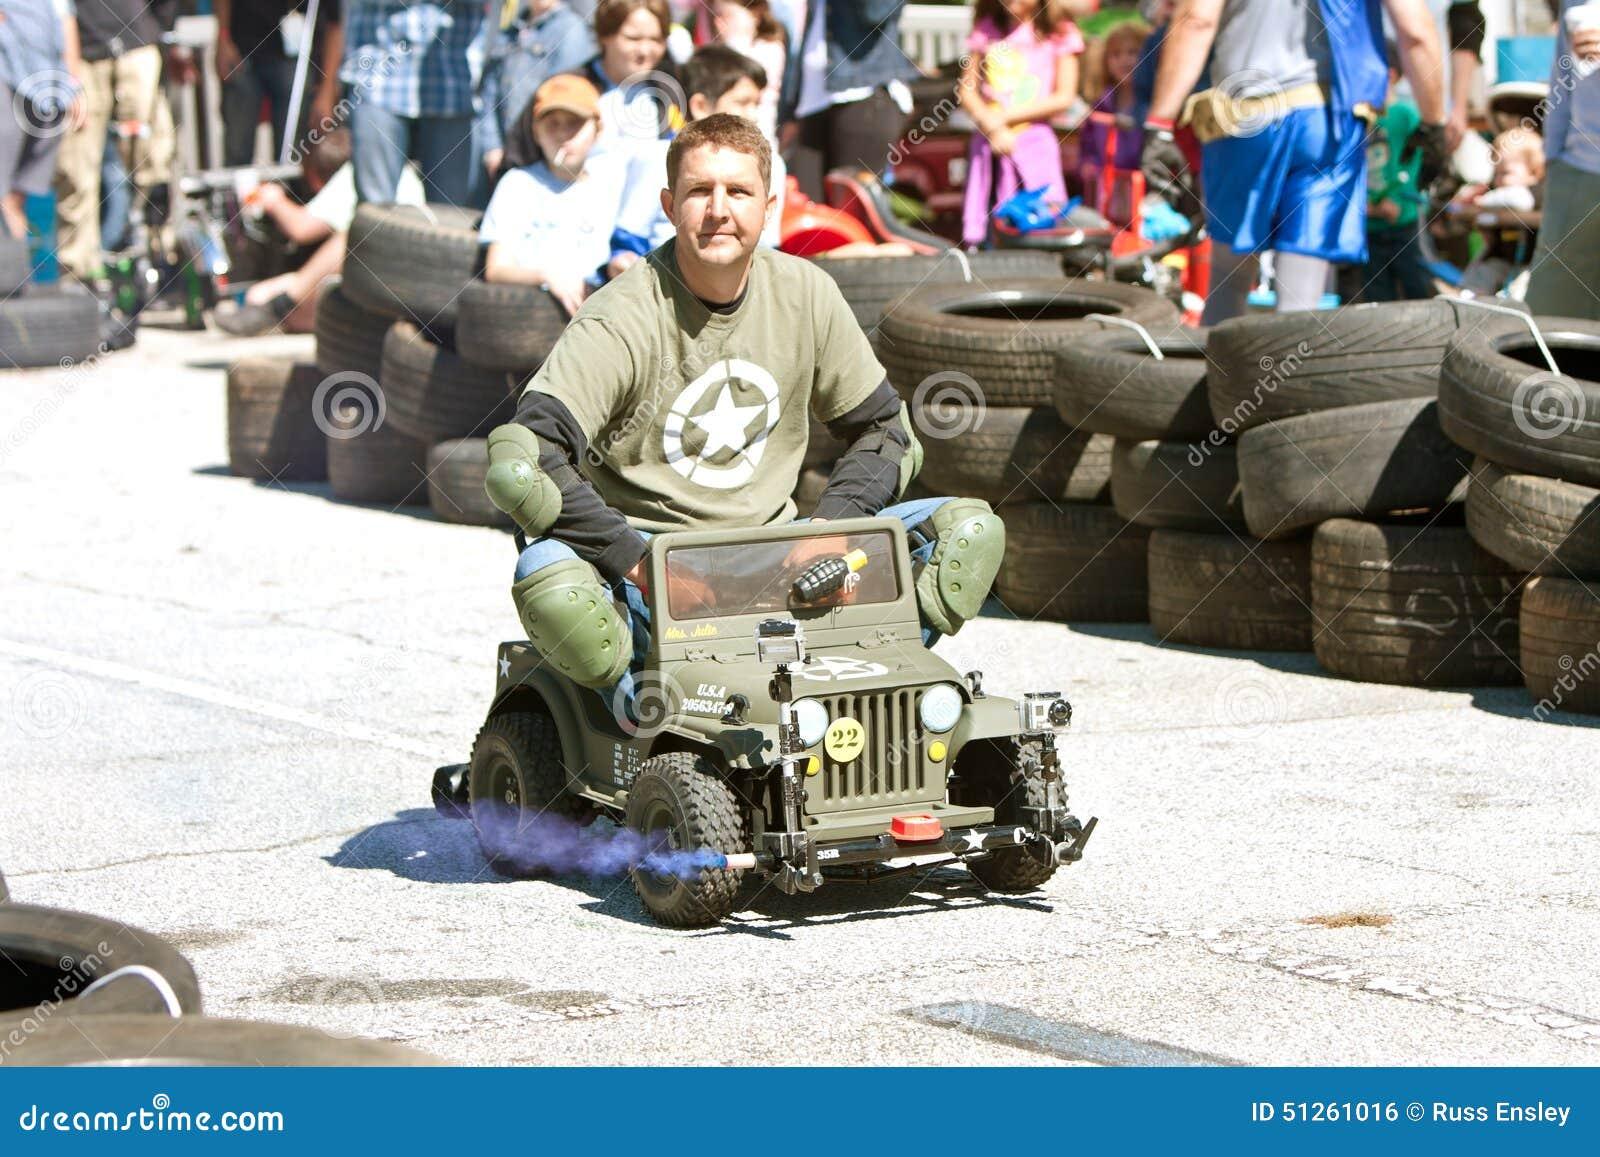 [Image: man-races-miniature-army-jeep-fair-decat...261016.jpg]